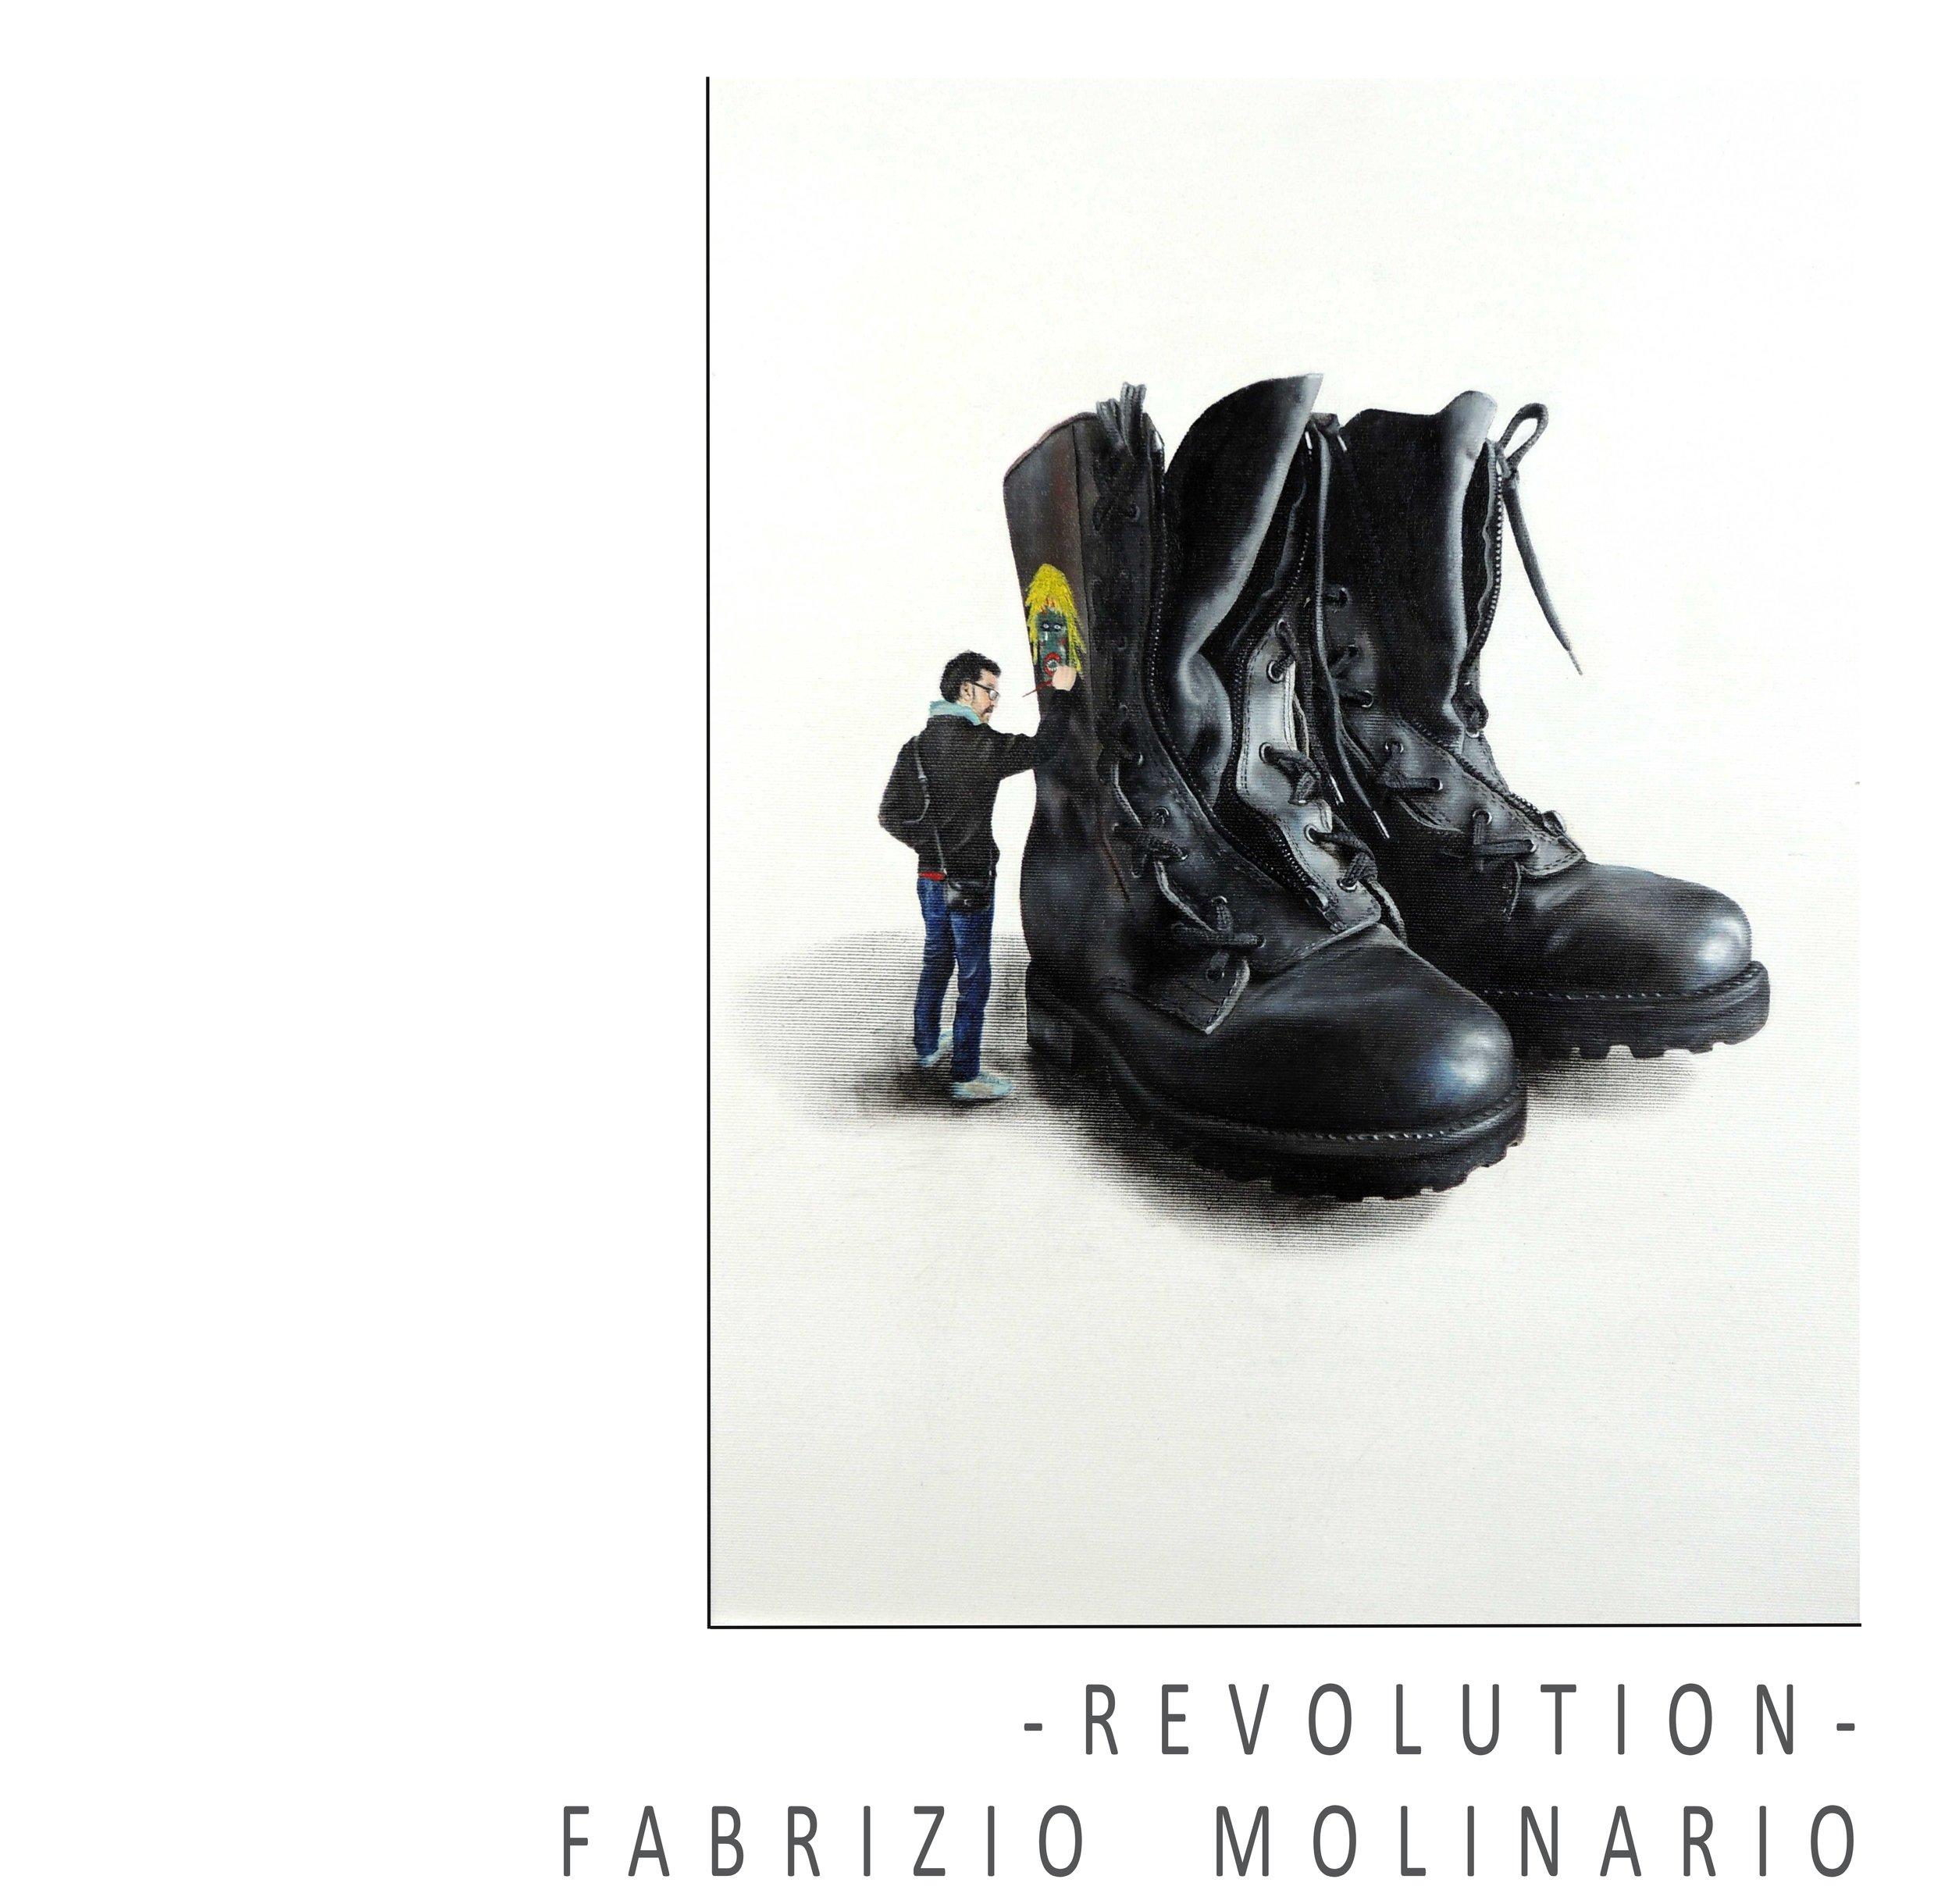 REVOLUTION 2-1-Pagina001.jpeg